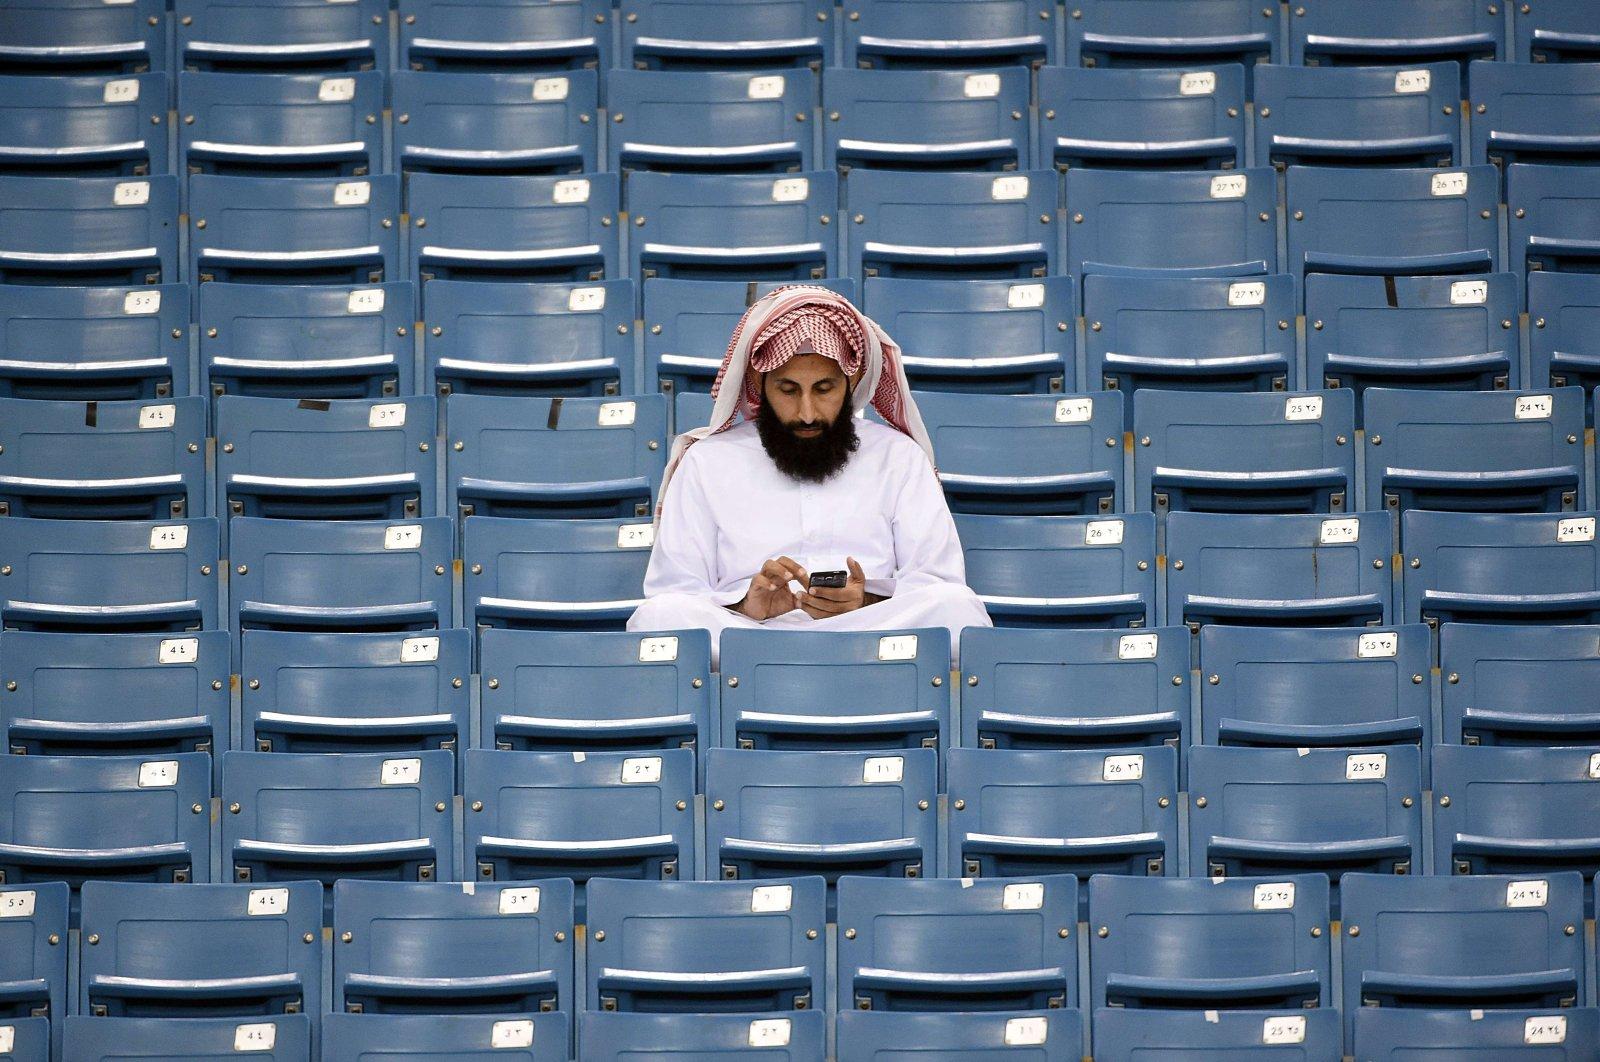 A Saudi Arabian fan checks his mobile phone before the final of the 22nd Gulf Cup of Nations football match against Saudi Arabia at the King Fahad stadium in Riyadh, Saudi Arabia, Nov. 26, 2014. (AFP Photo)